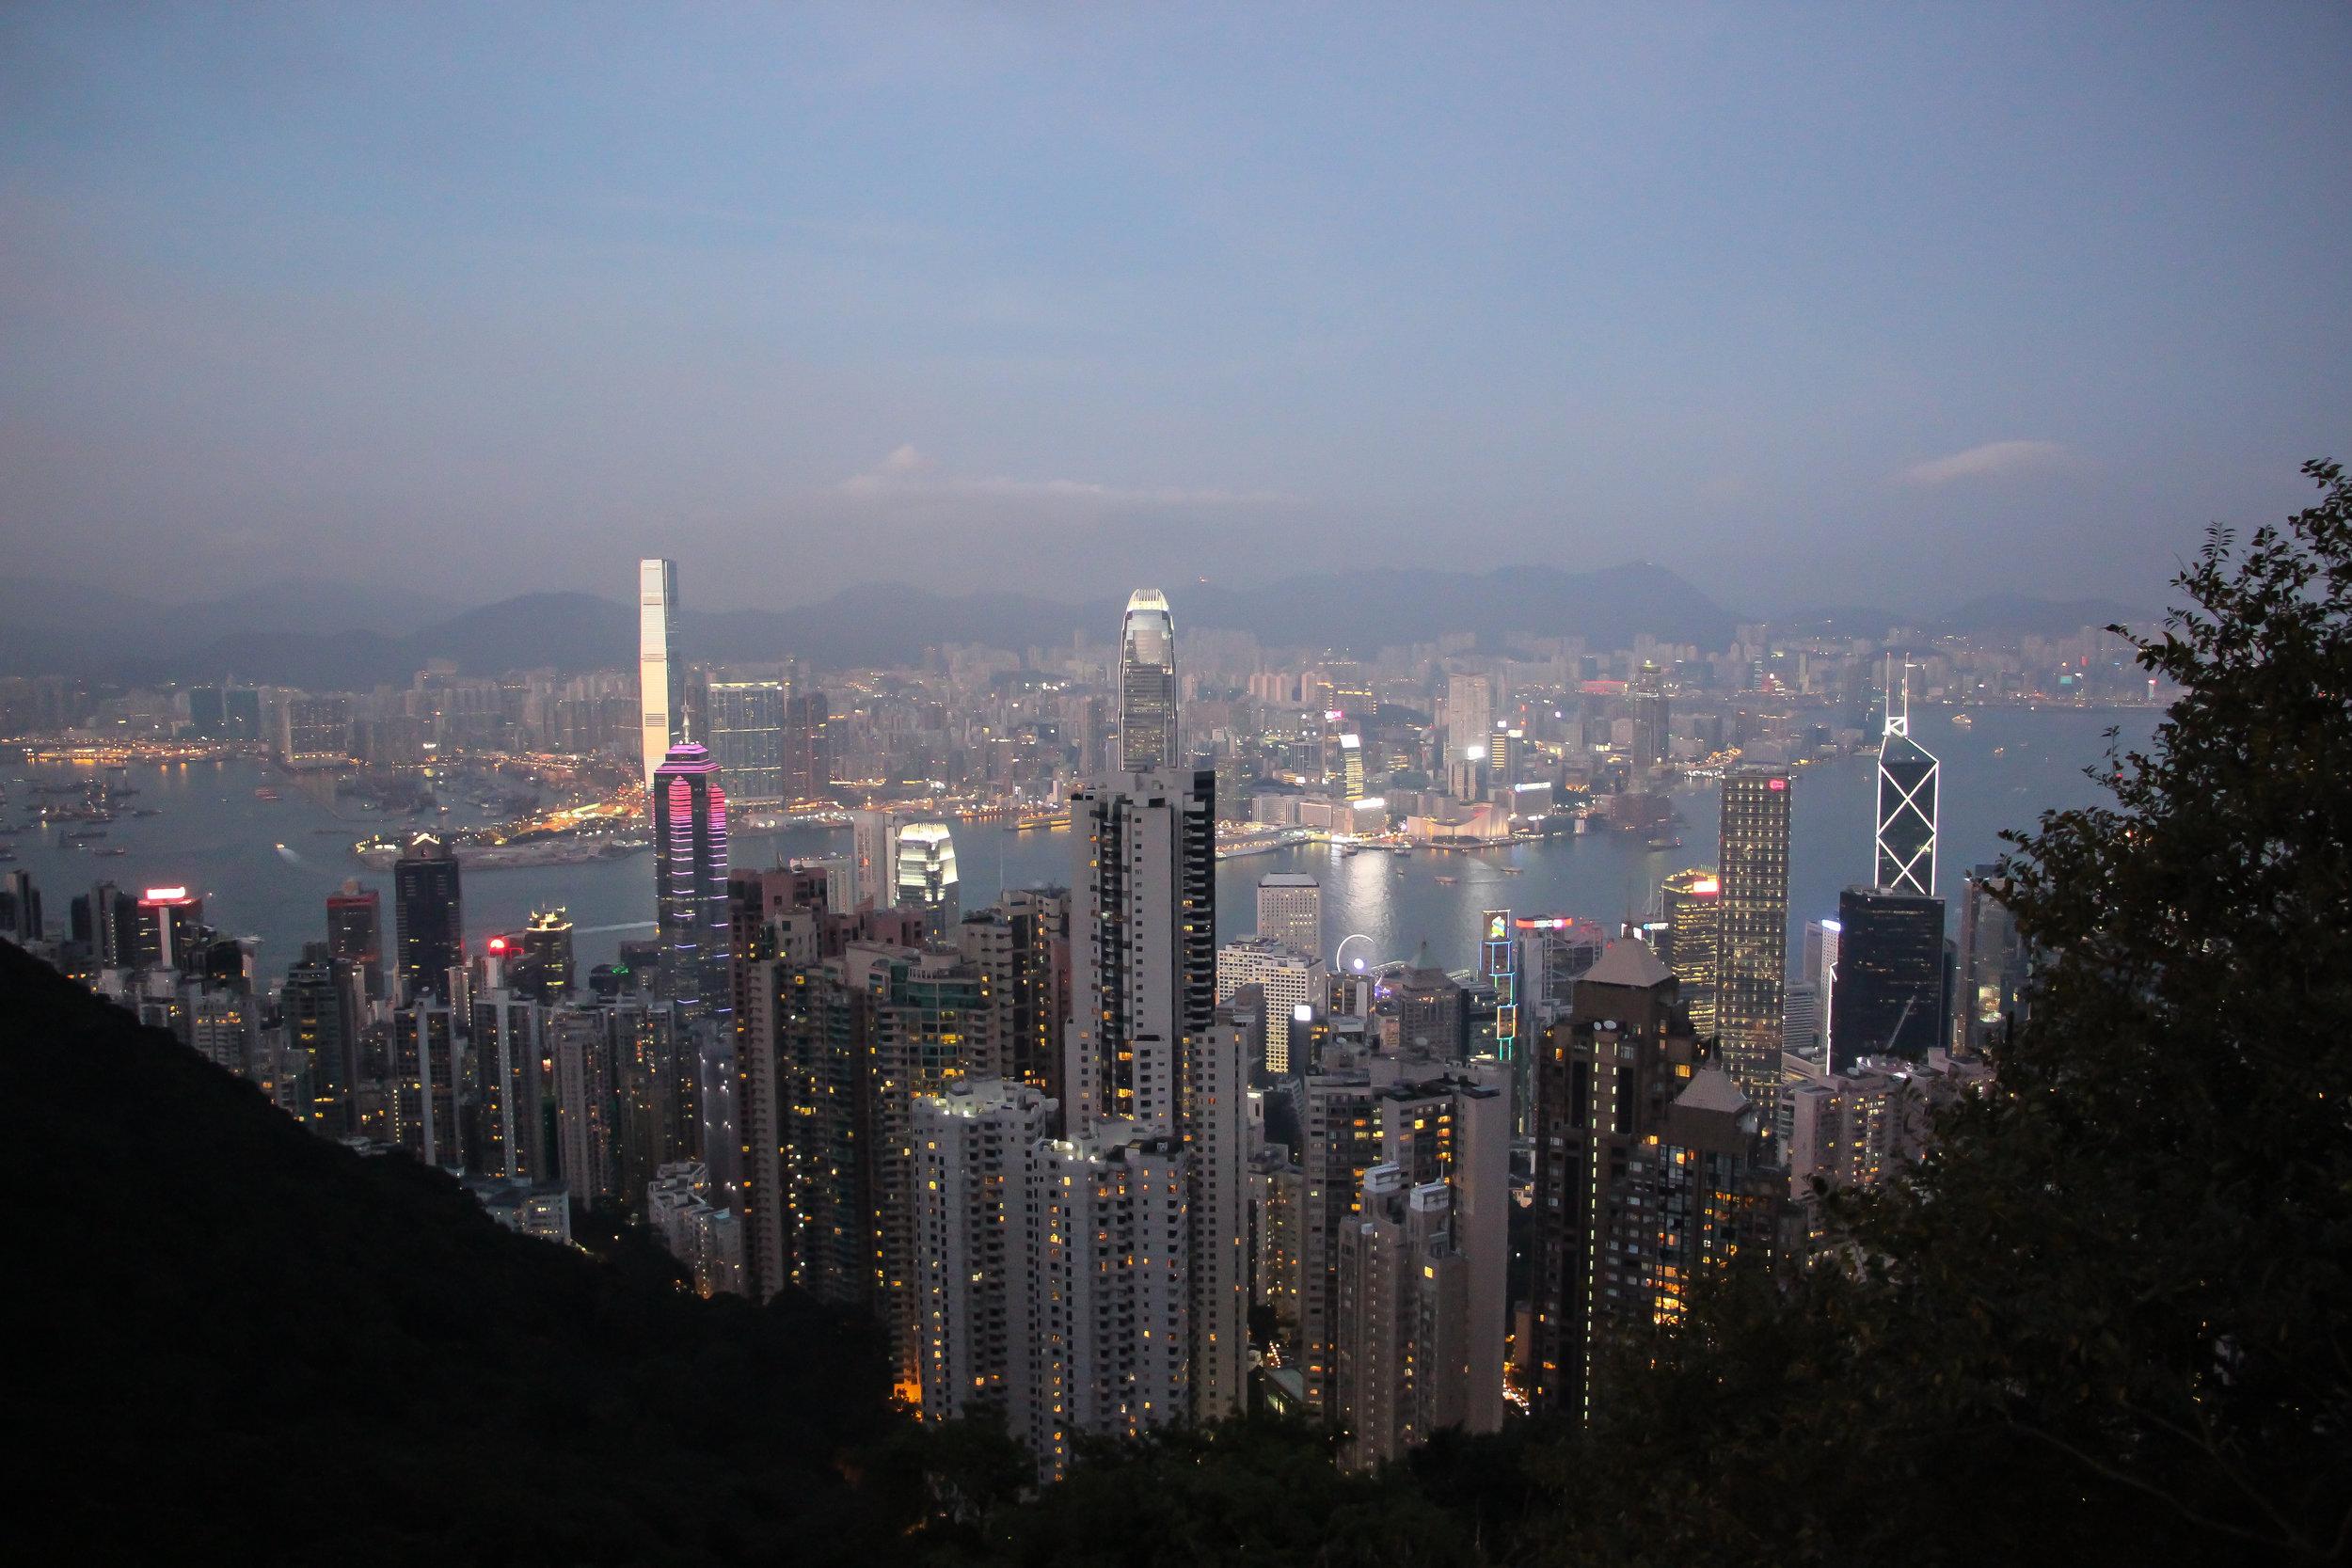 HONG KONG, HONG KONG ISLAND, kowloon, SOUTH CHINA SEA, VICTORIA PEAK, SUNSET, ASIA | DOLESSGETMOREDONE.COM |